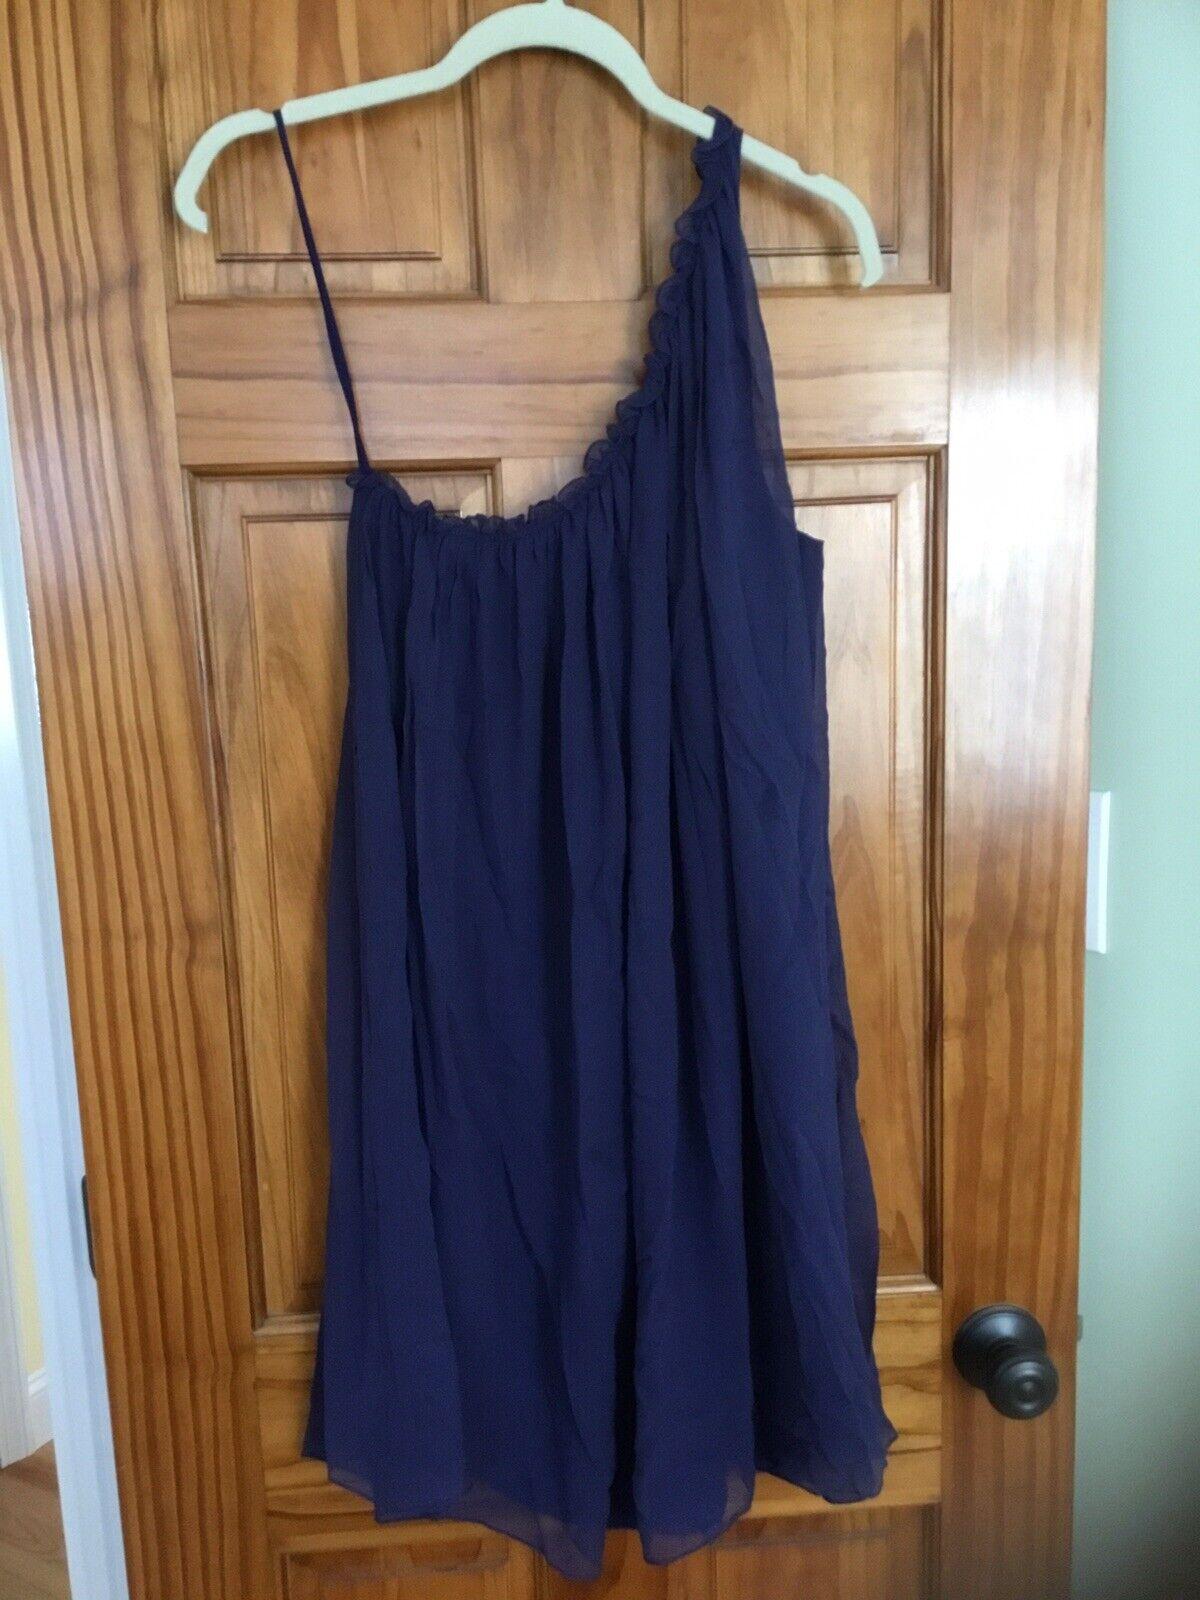 Elizabeth and James 'Raquel' Navy One Shoulder Dress, Size L  Retail